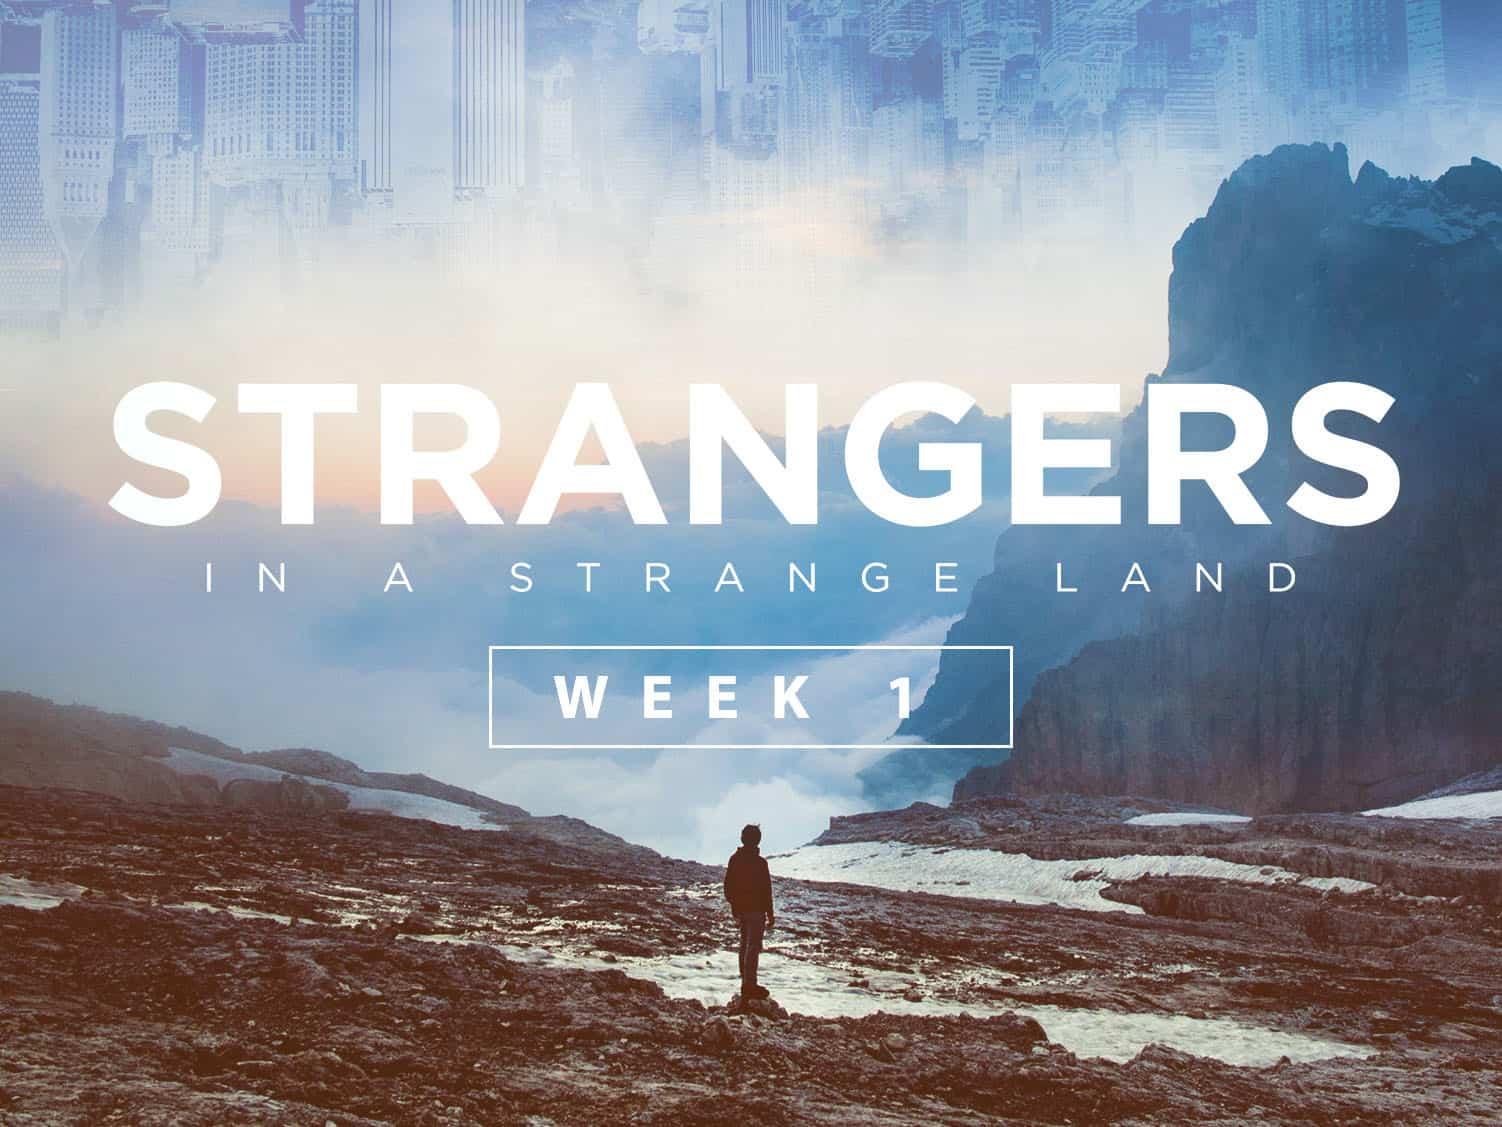 Strangers in a Strange Land: Week 1